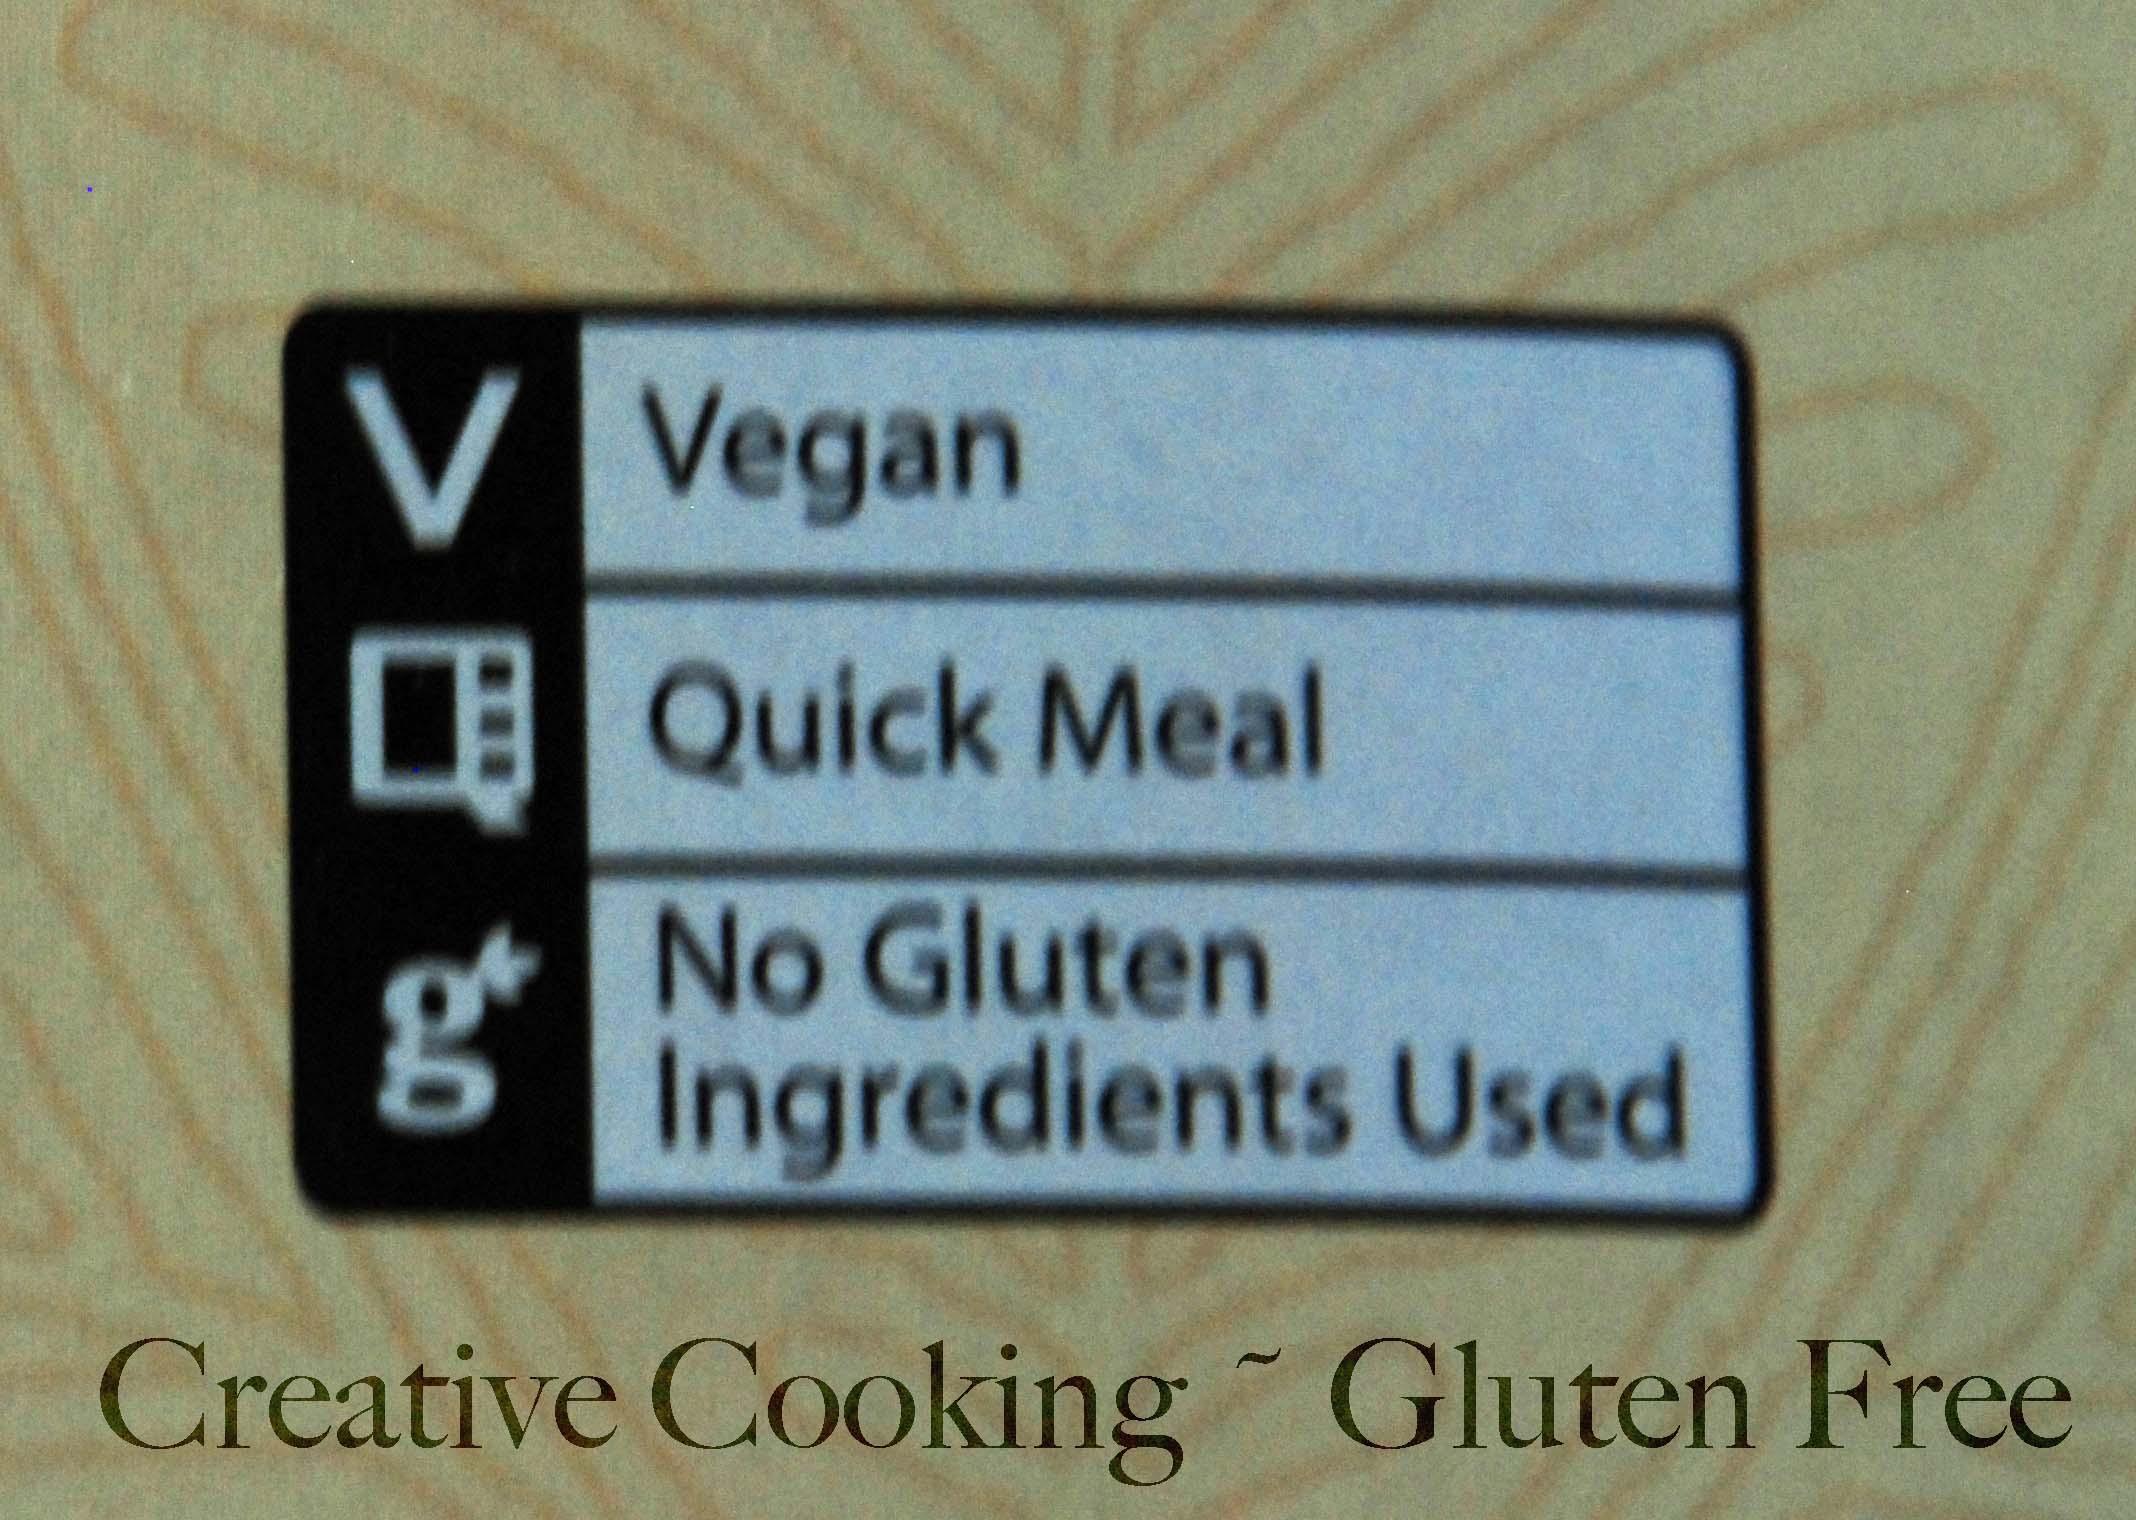 Vpc Gluten Avoid Ingredients